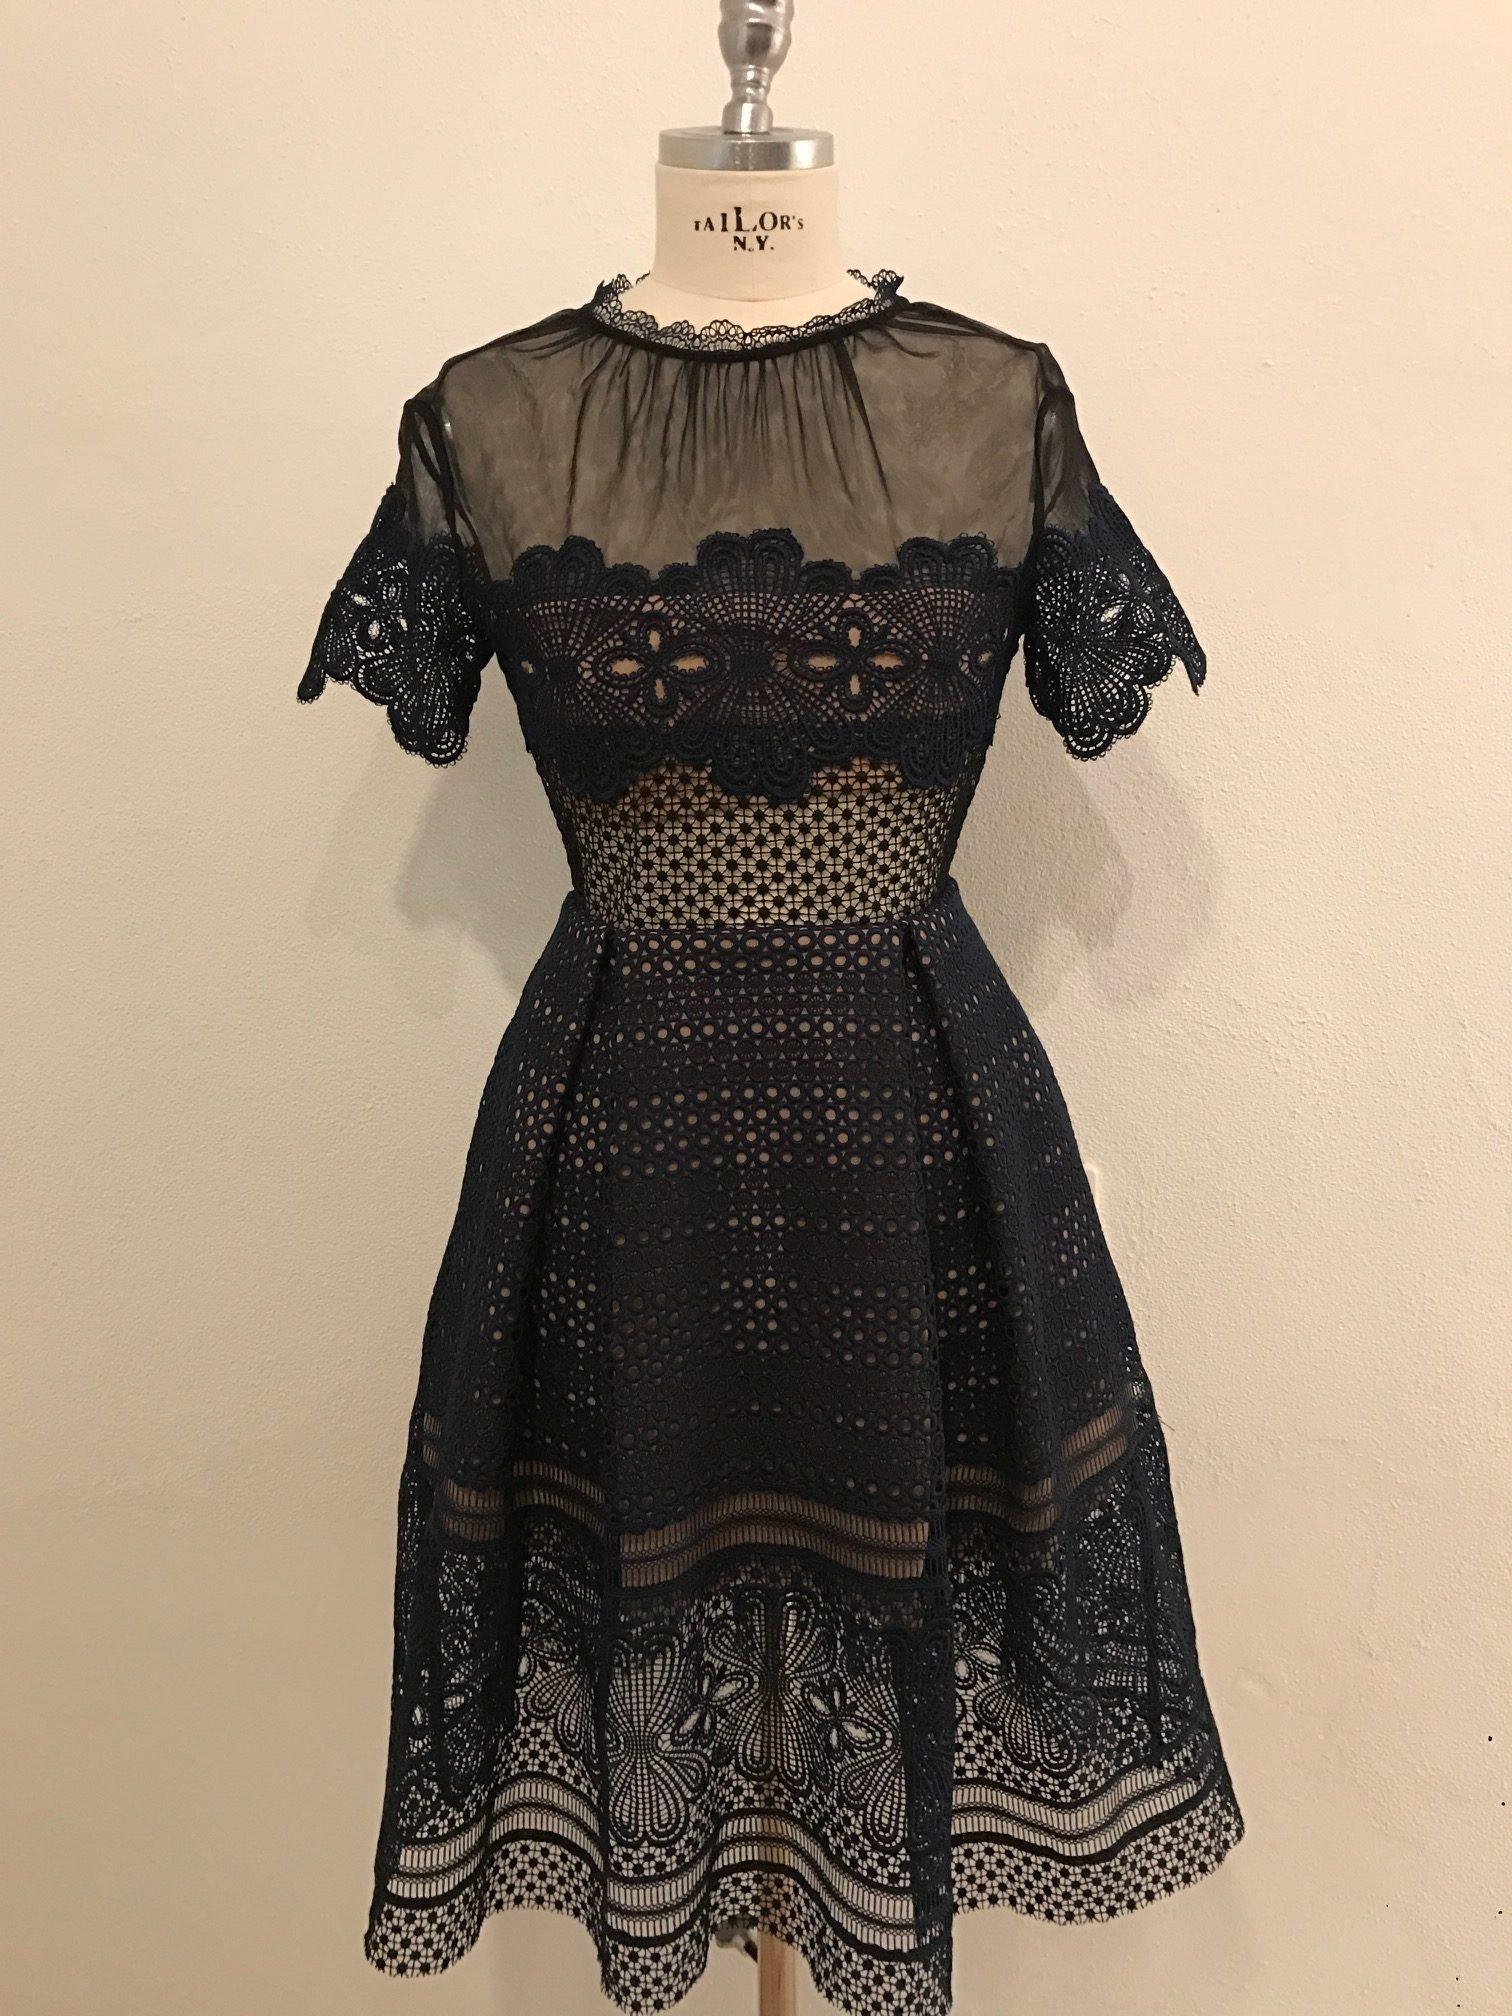 Großartig Kleid Dunkelblau Spitze Stylish17 Schön Kleid Dunkelblau Spitze Stylish